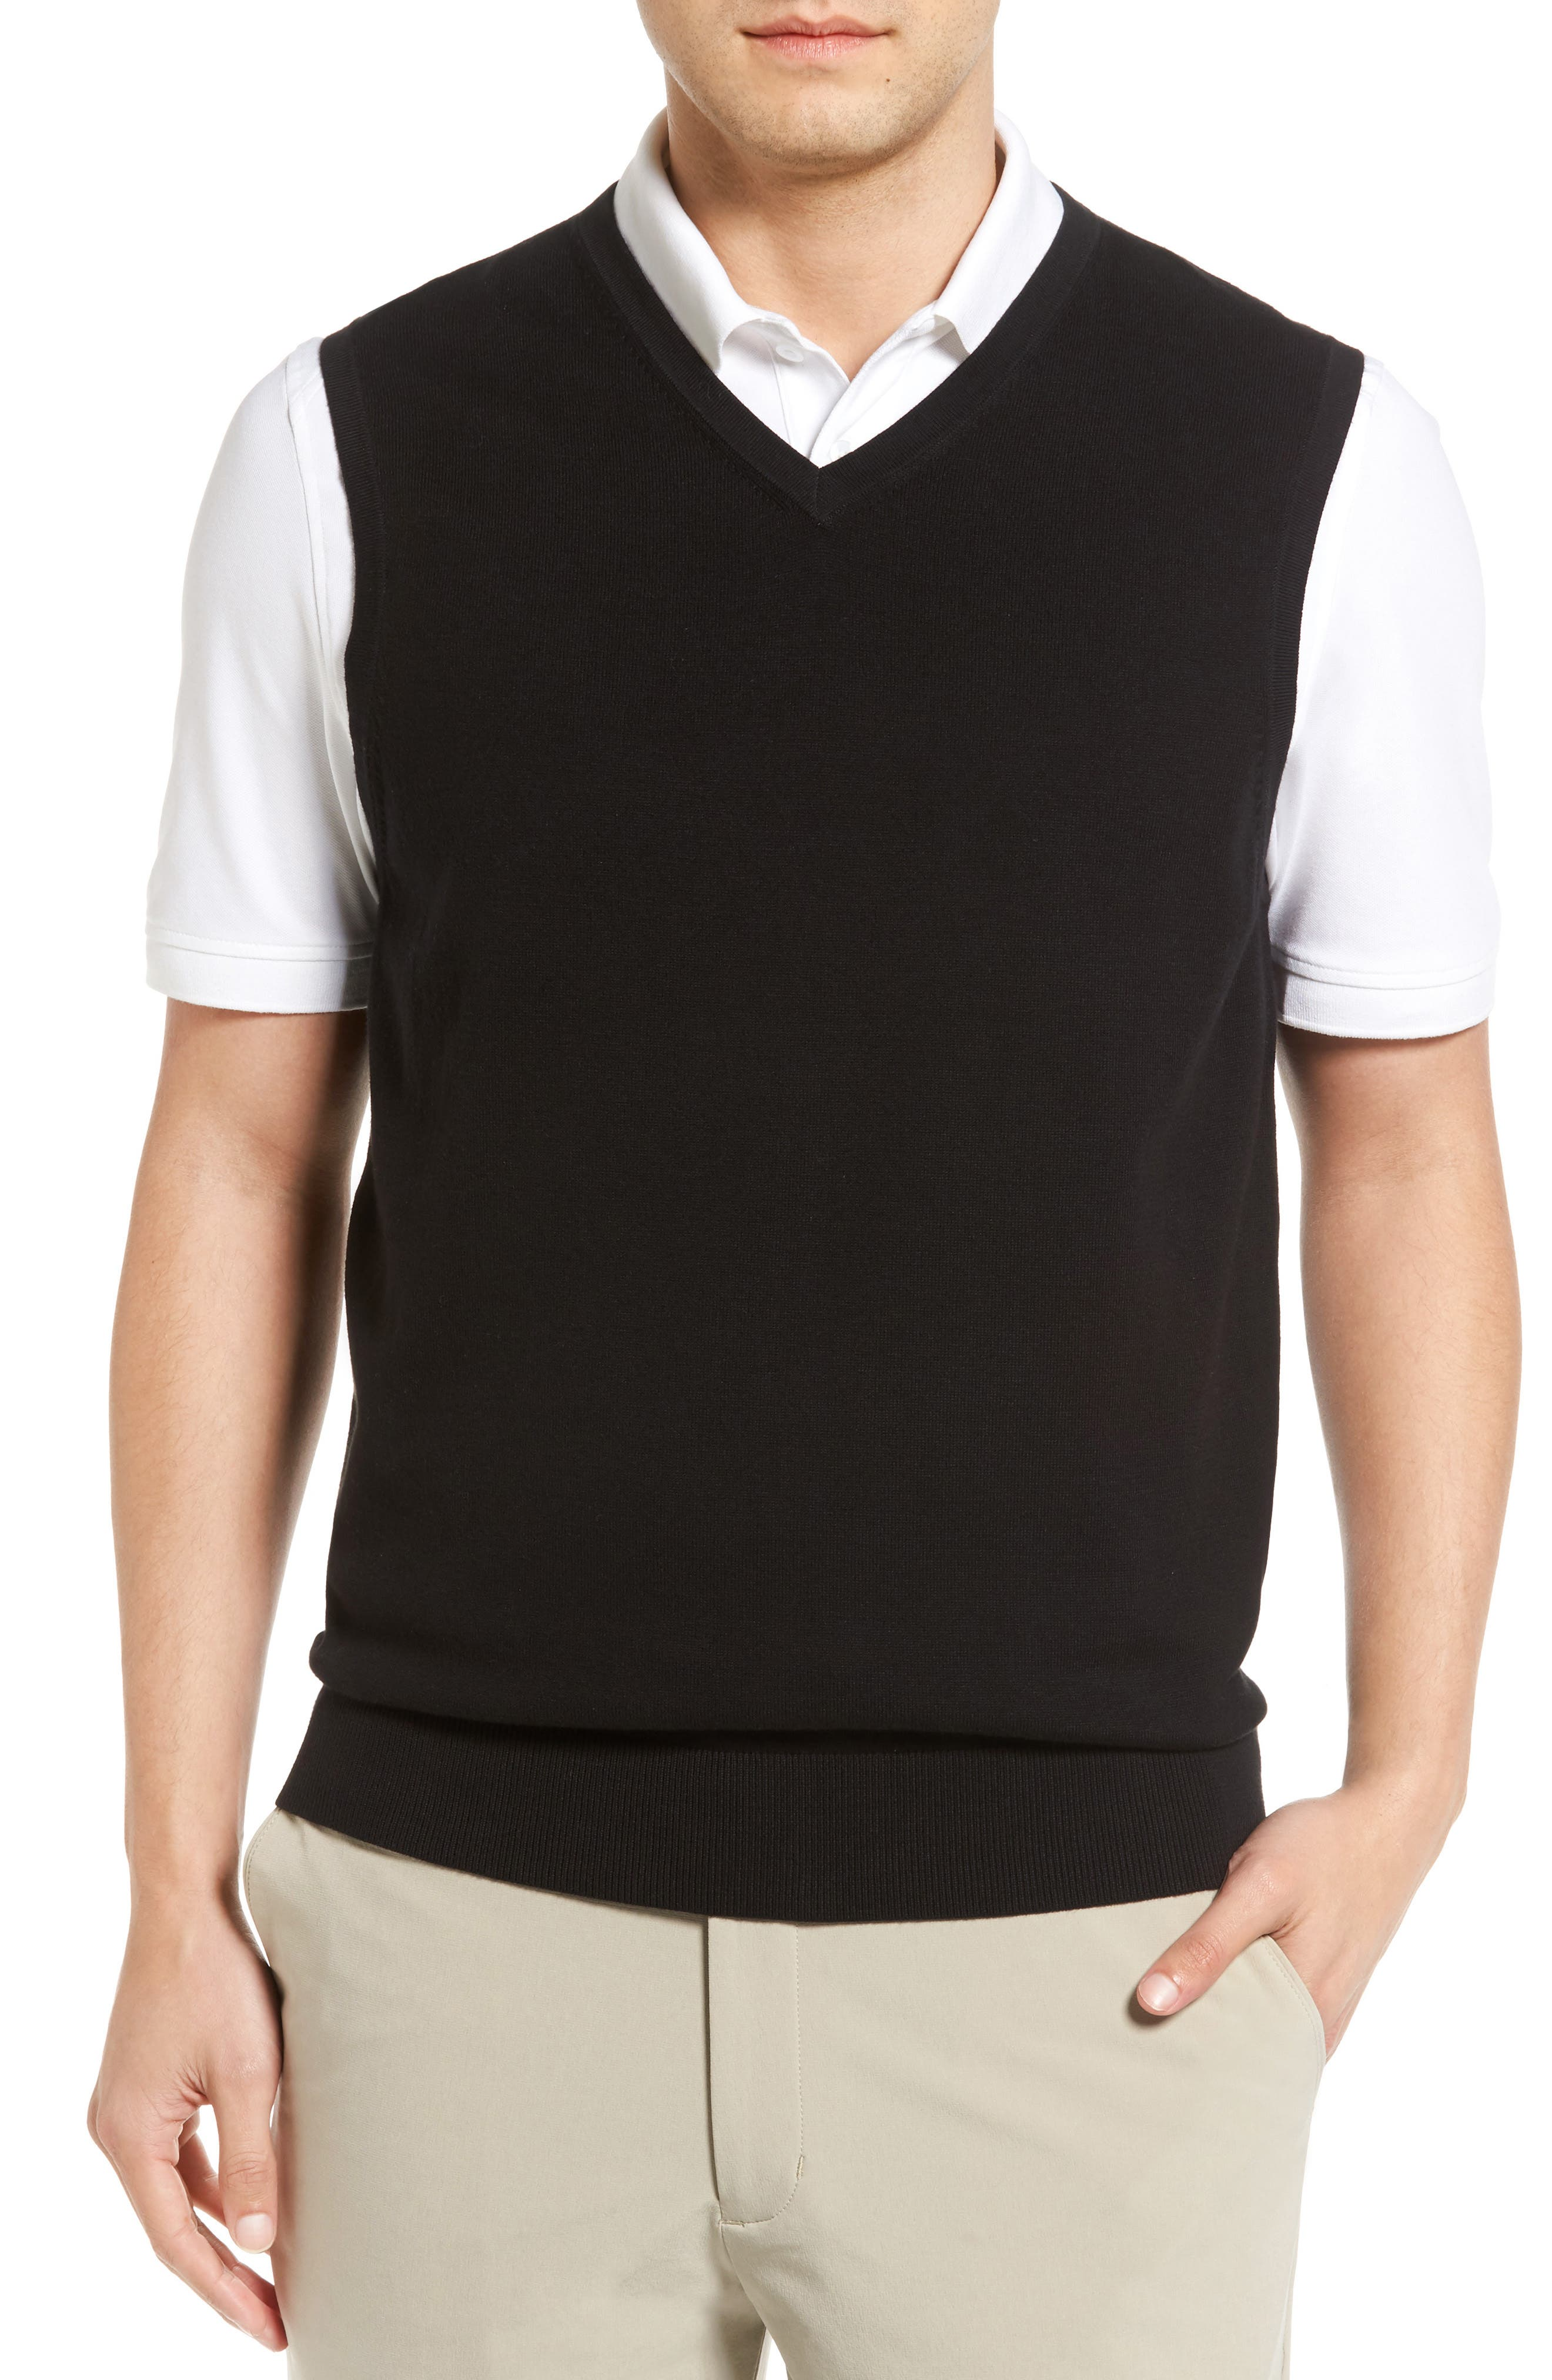 Cutter & Buck Lakemont V-Neck Sweater Vest, Black